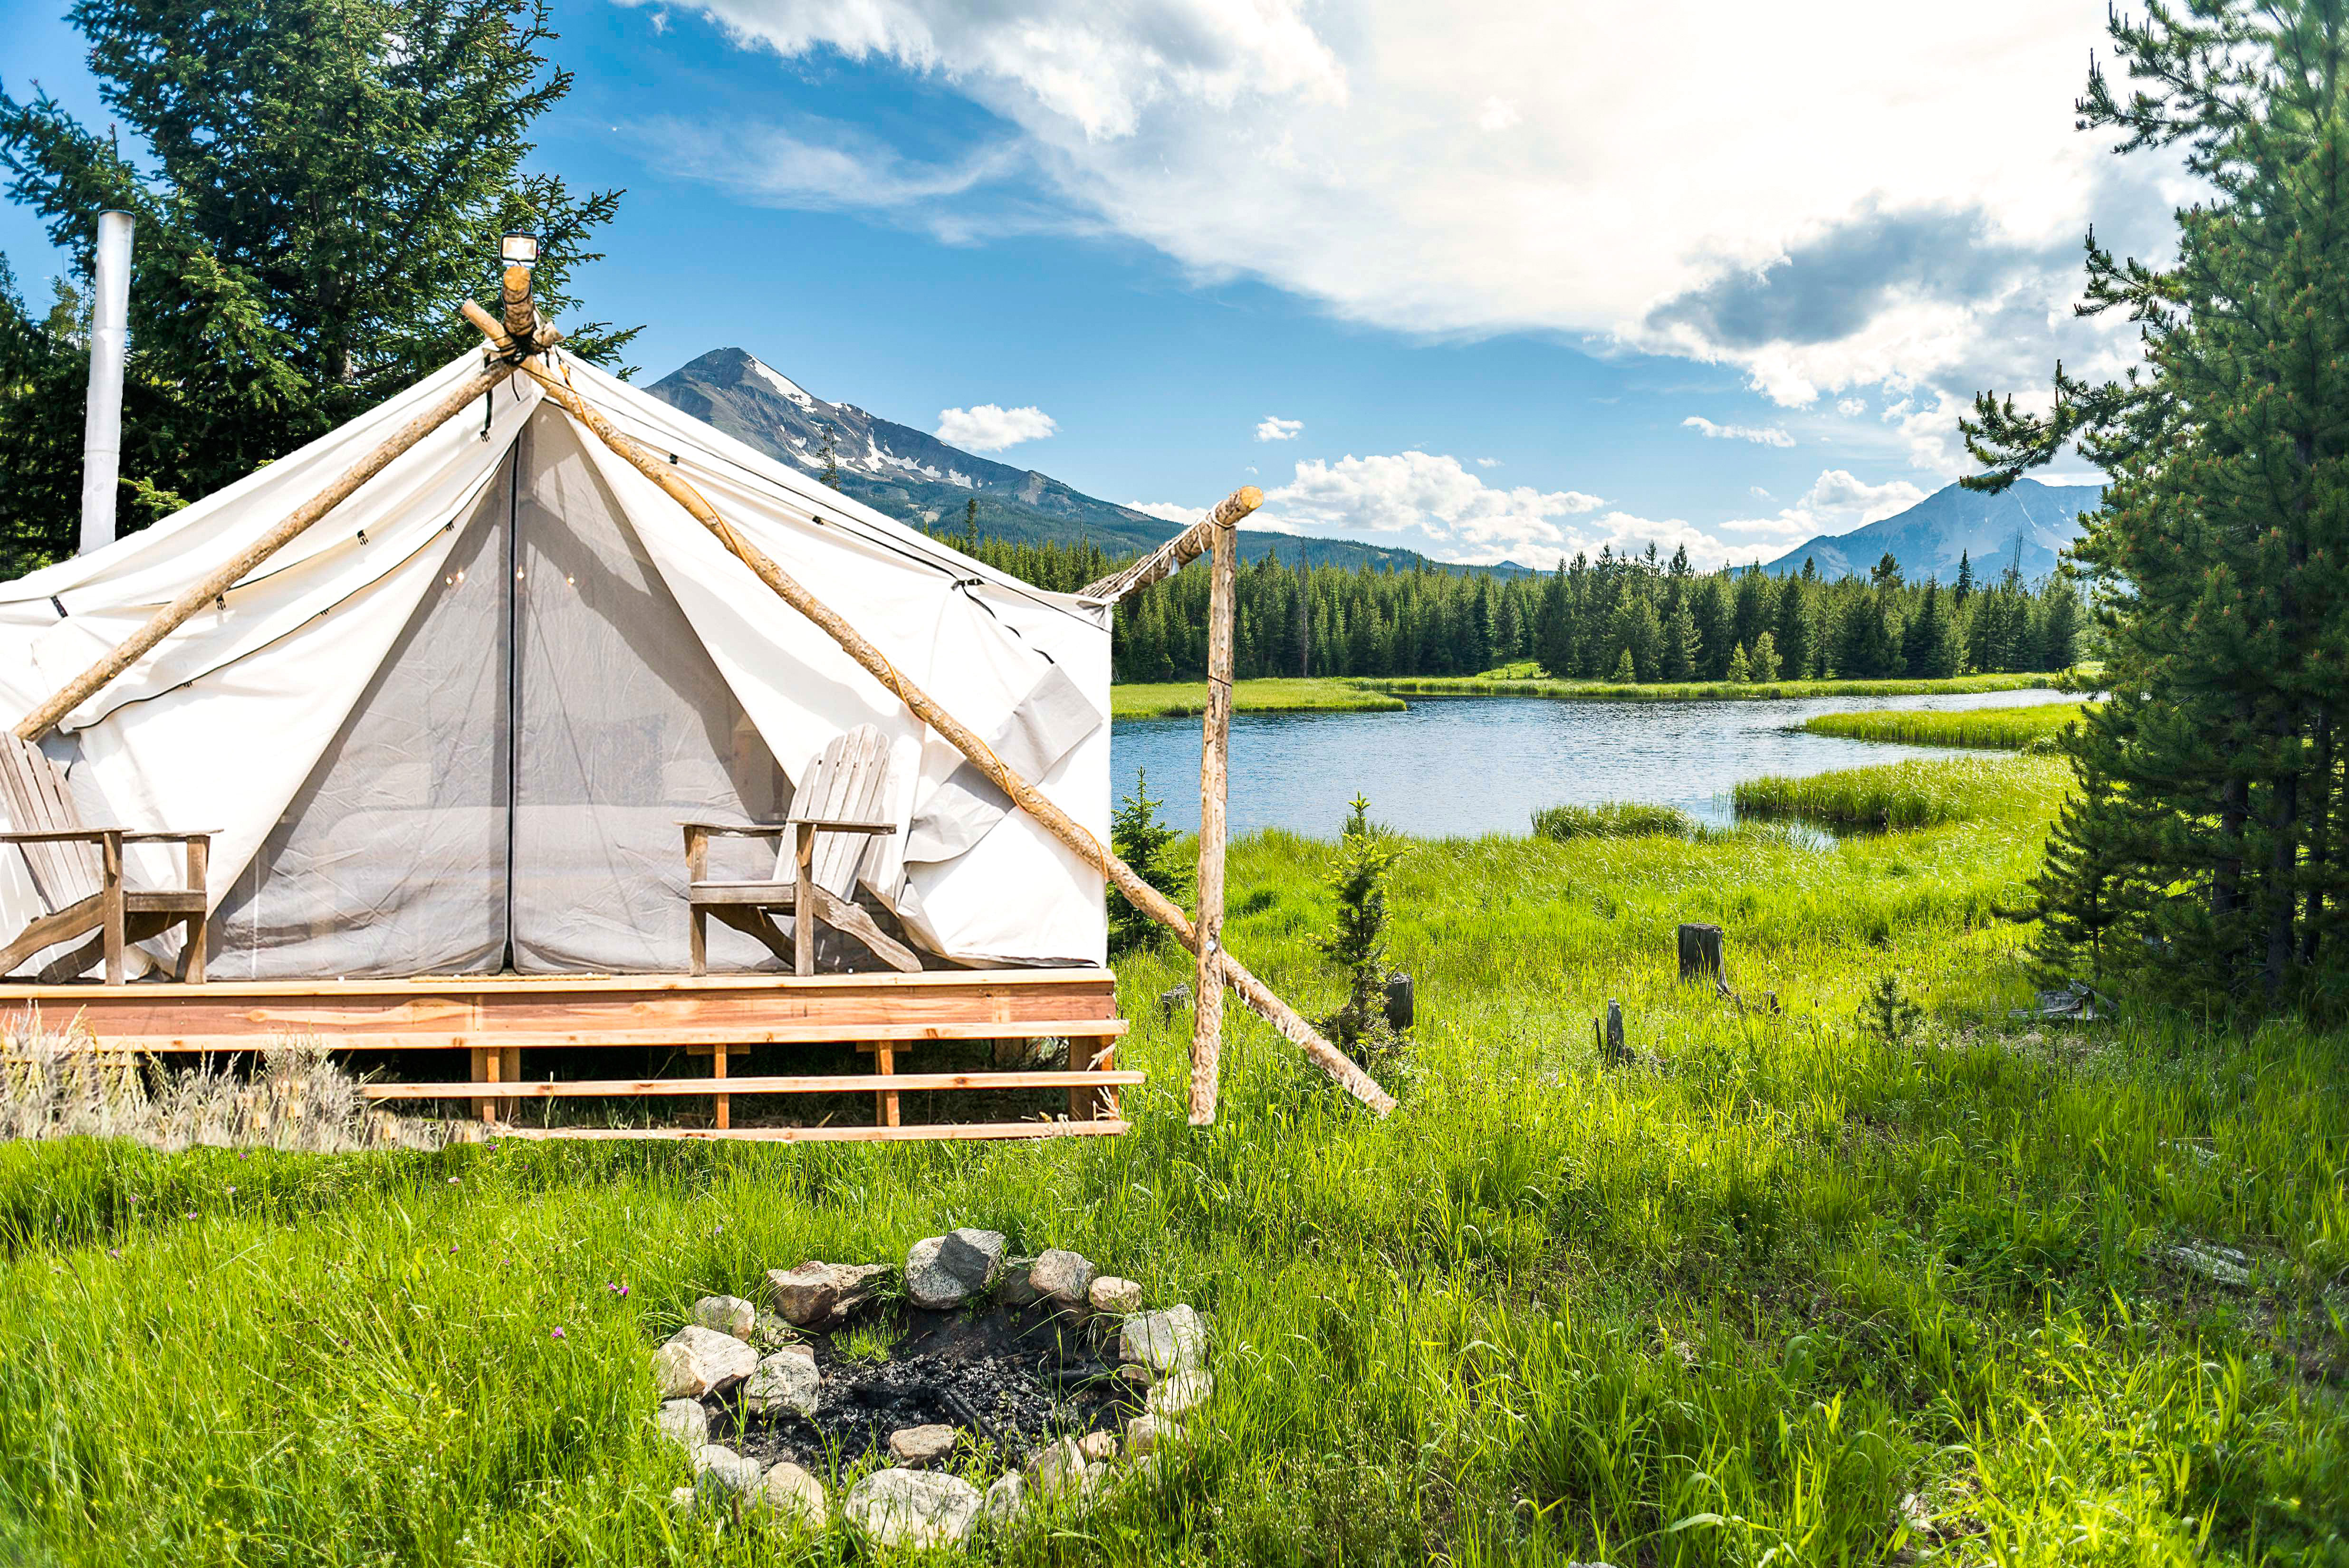 tent fireplace mountain pond yellowstone